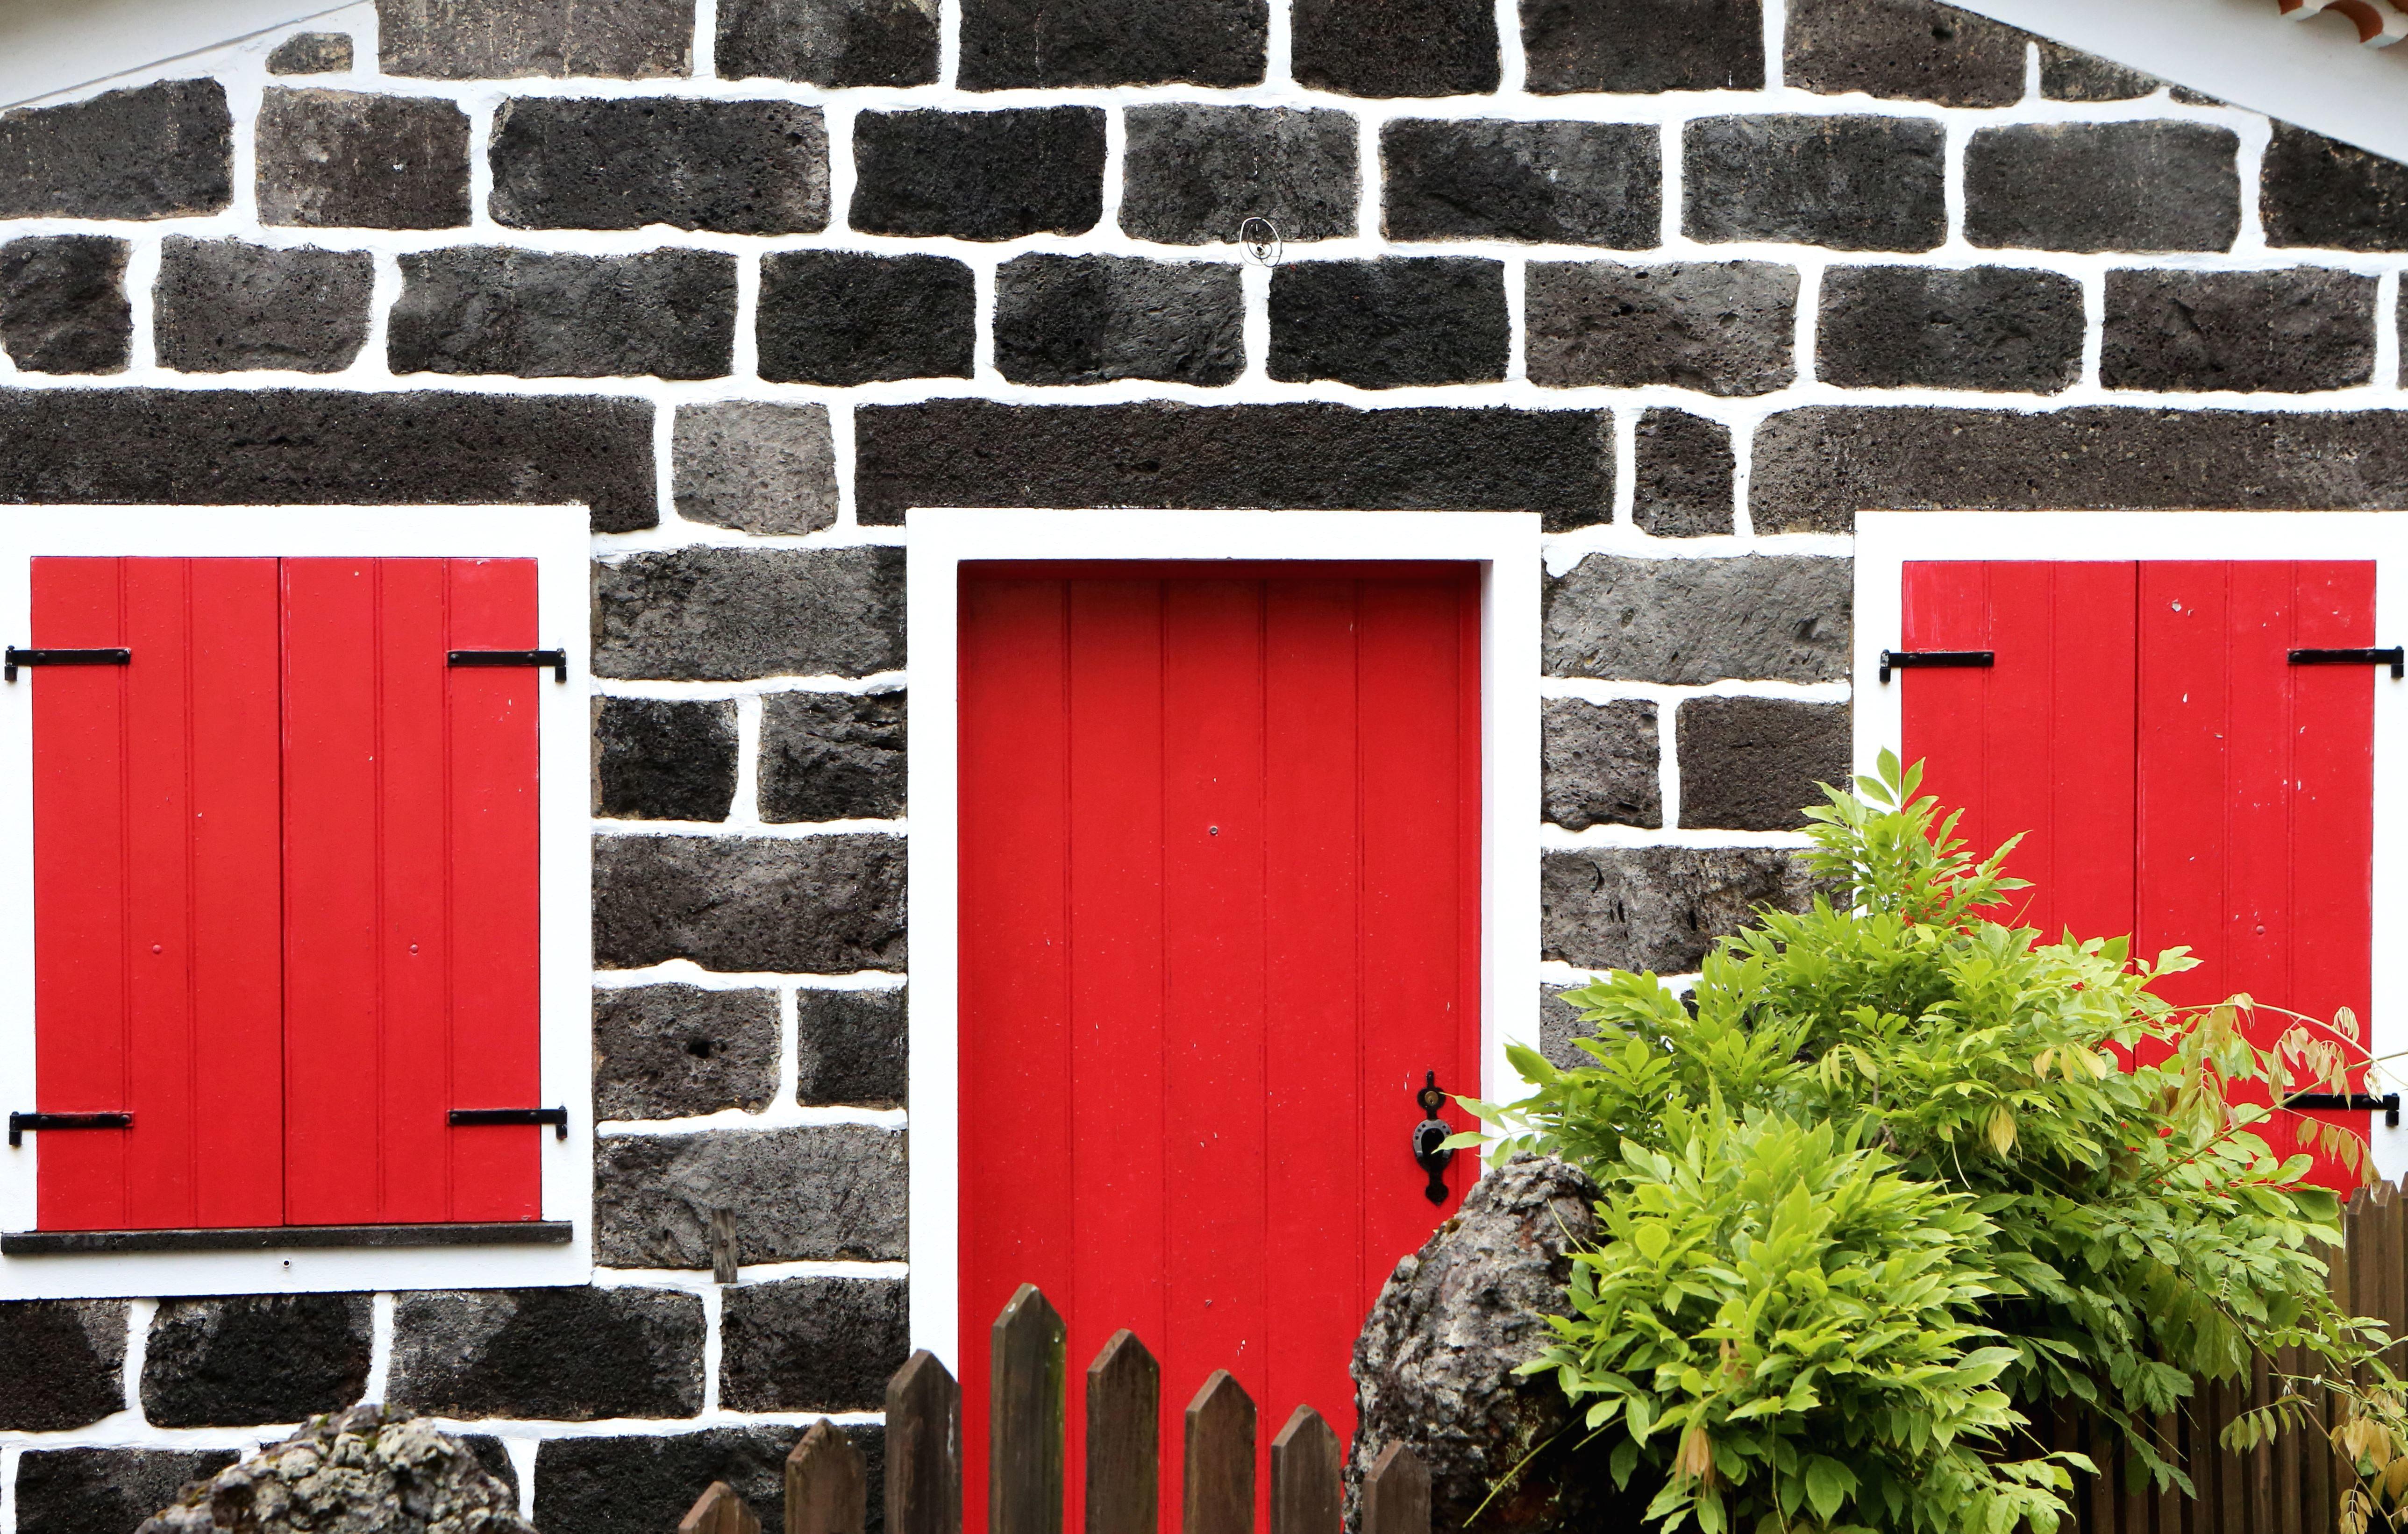 image libre mur fen tre volets fen tres architecture brique porte fa ade cl ture. Black Bedroom Furniture Sets. Home Design Ideas